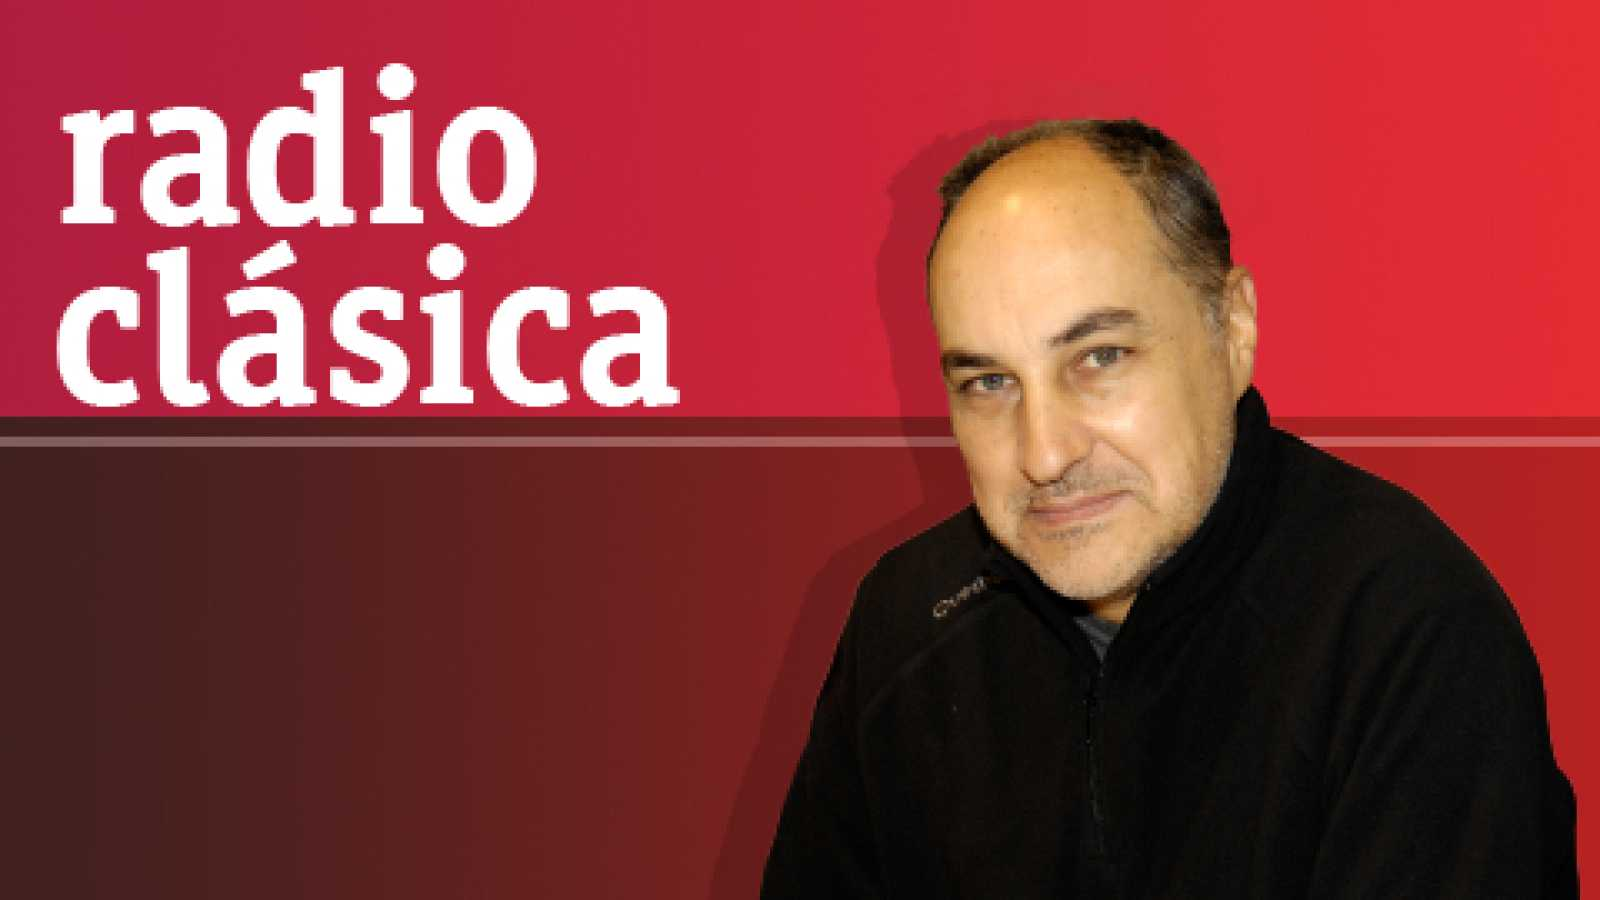 Los raros - Alexandre Tansman - 09/04/14 - escuchar ahora